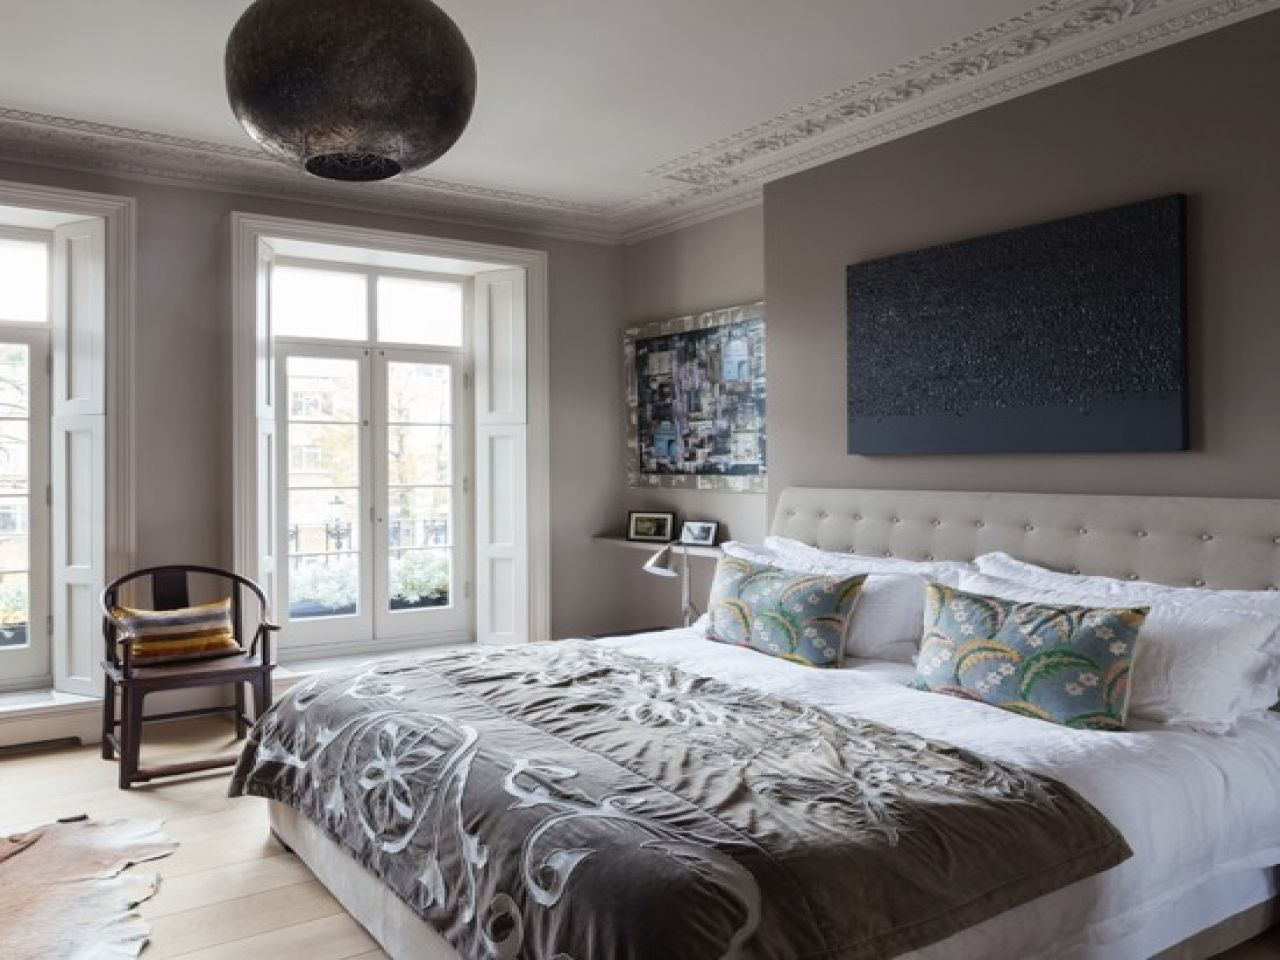 Decoration ideas for bedroom grey room decorating ideas  bedroom ideas  pinterest